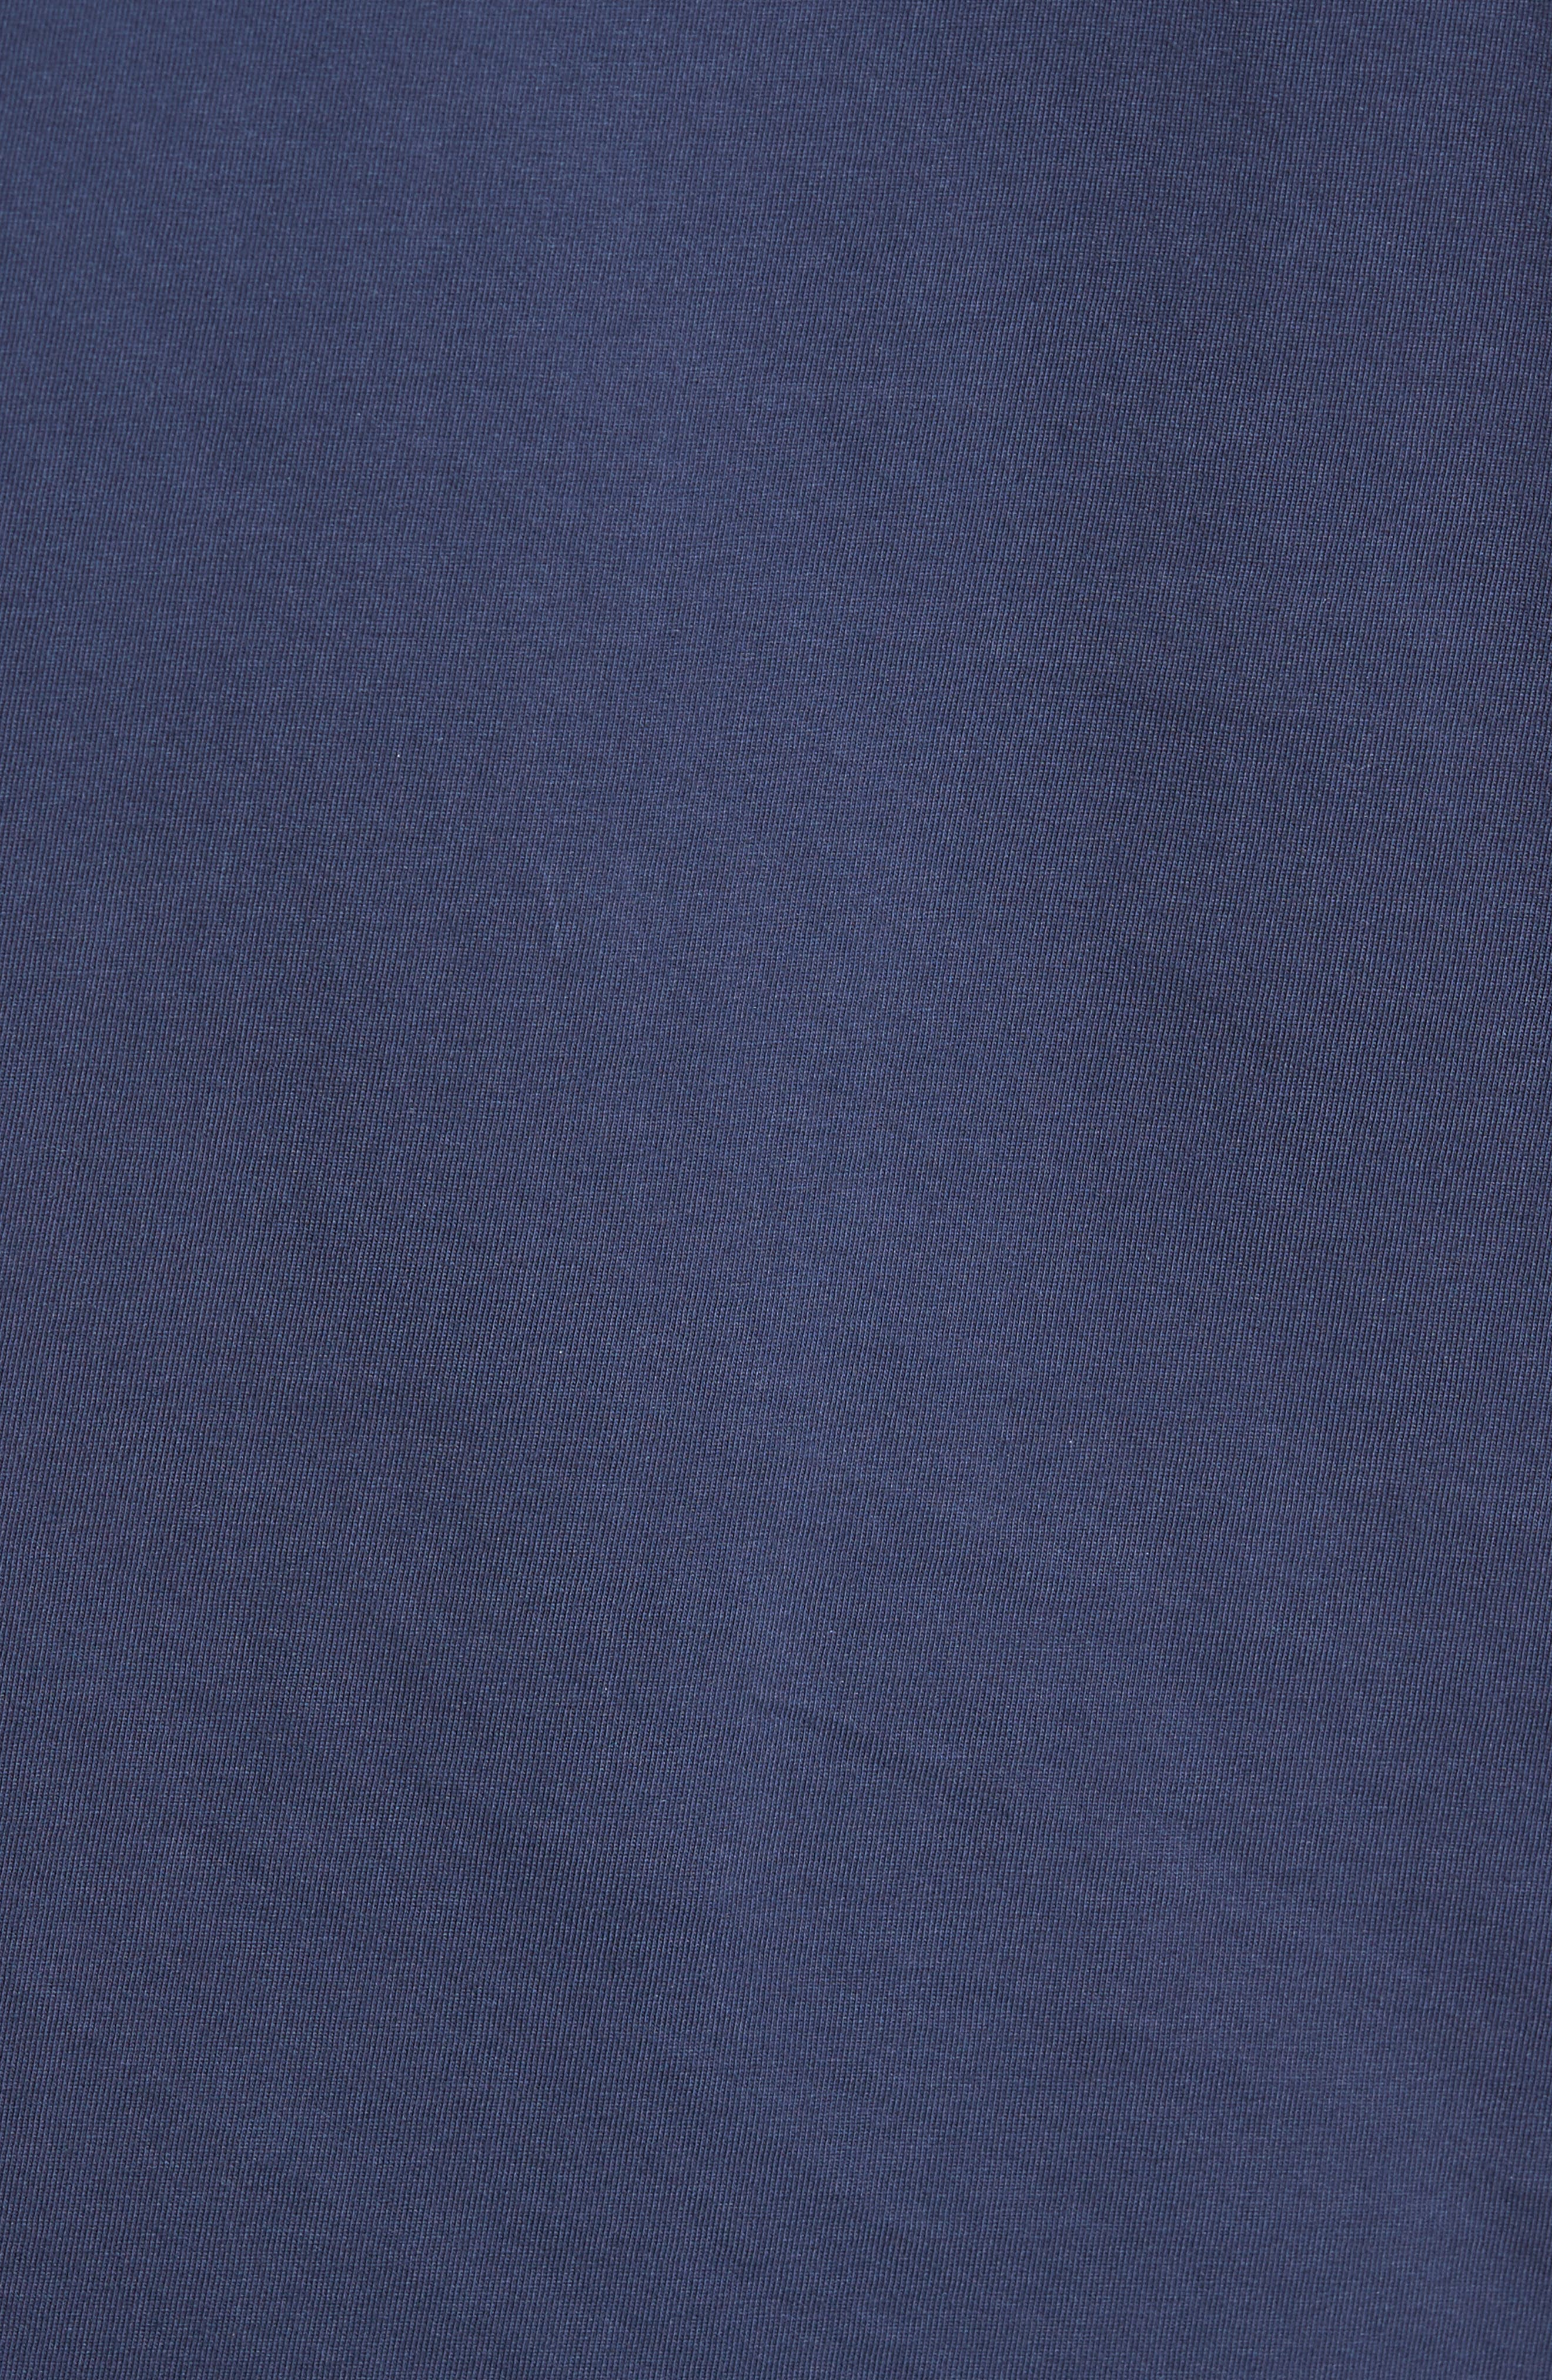 Infinity Box T-Shirt,                             Alternate thumbnail 5, color,                             400